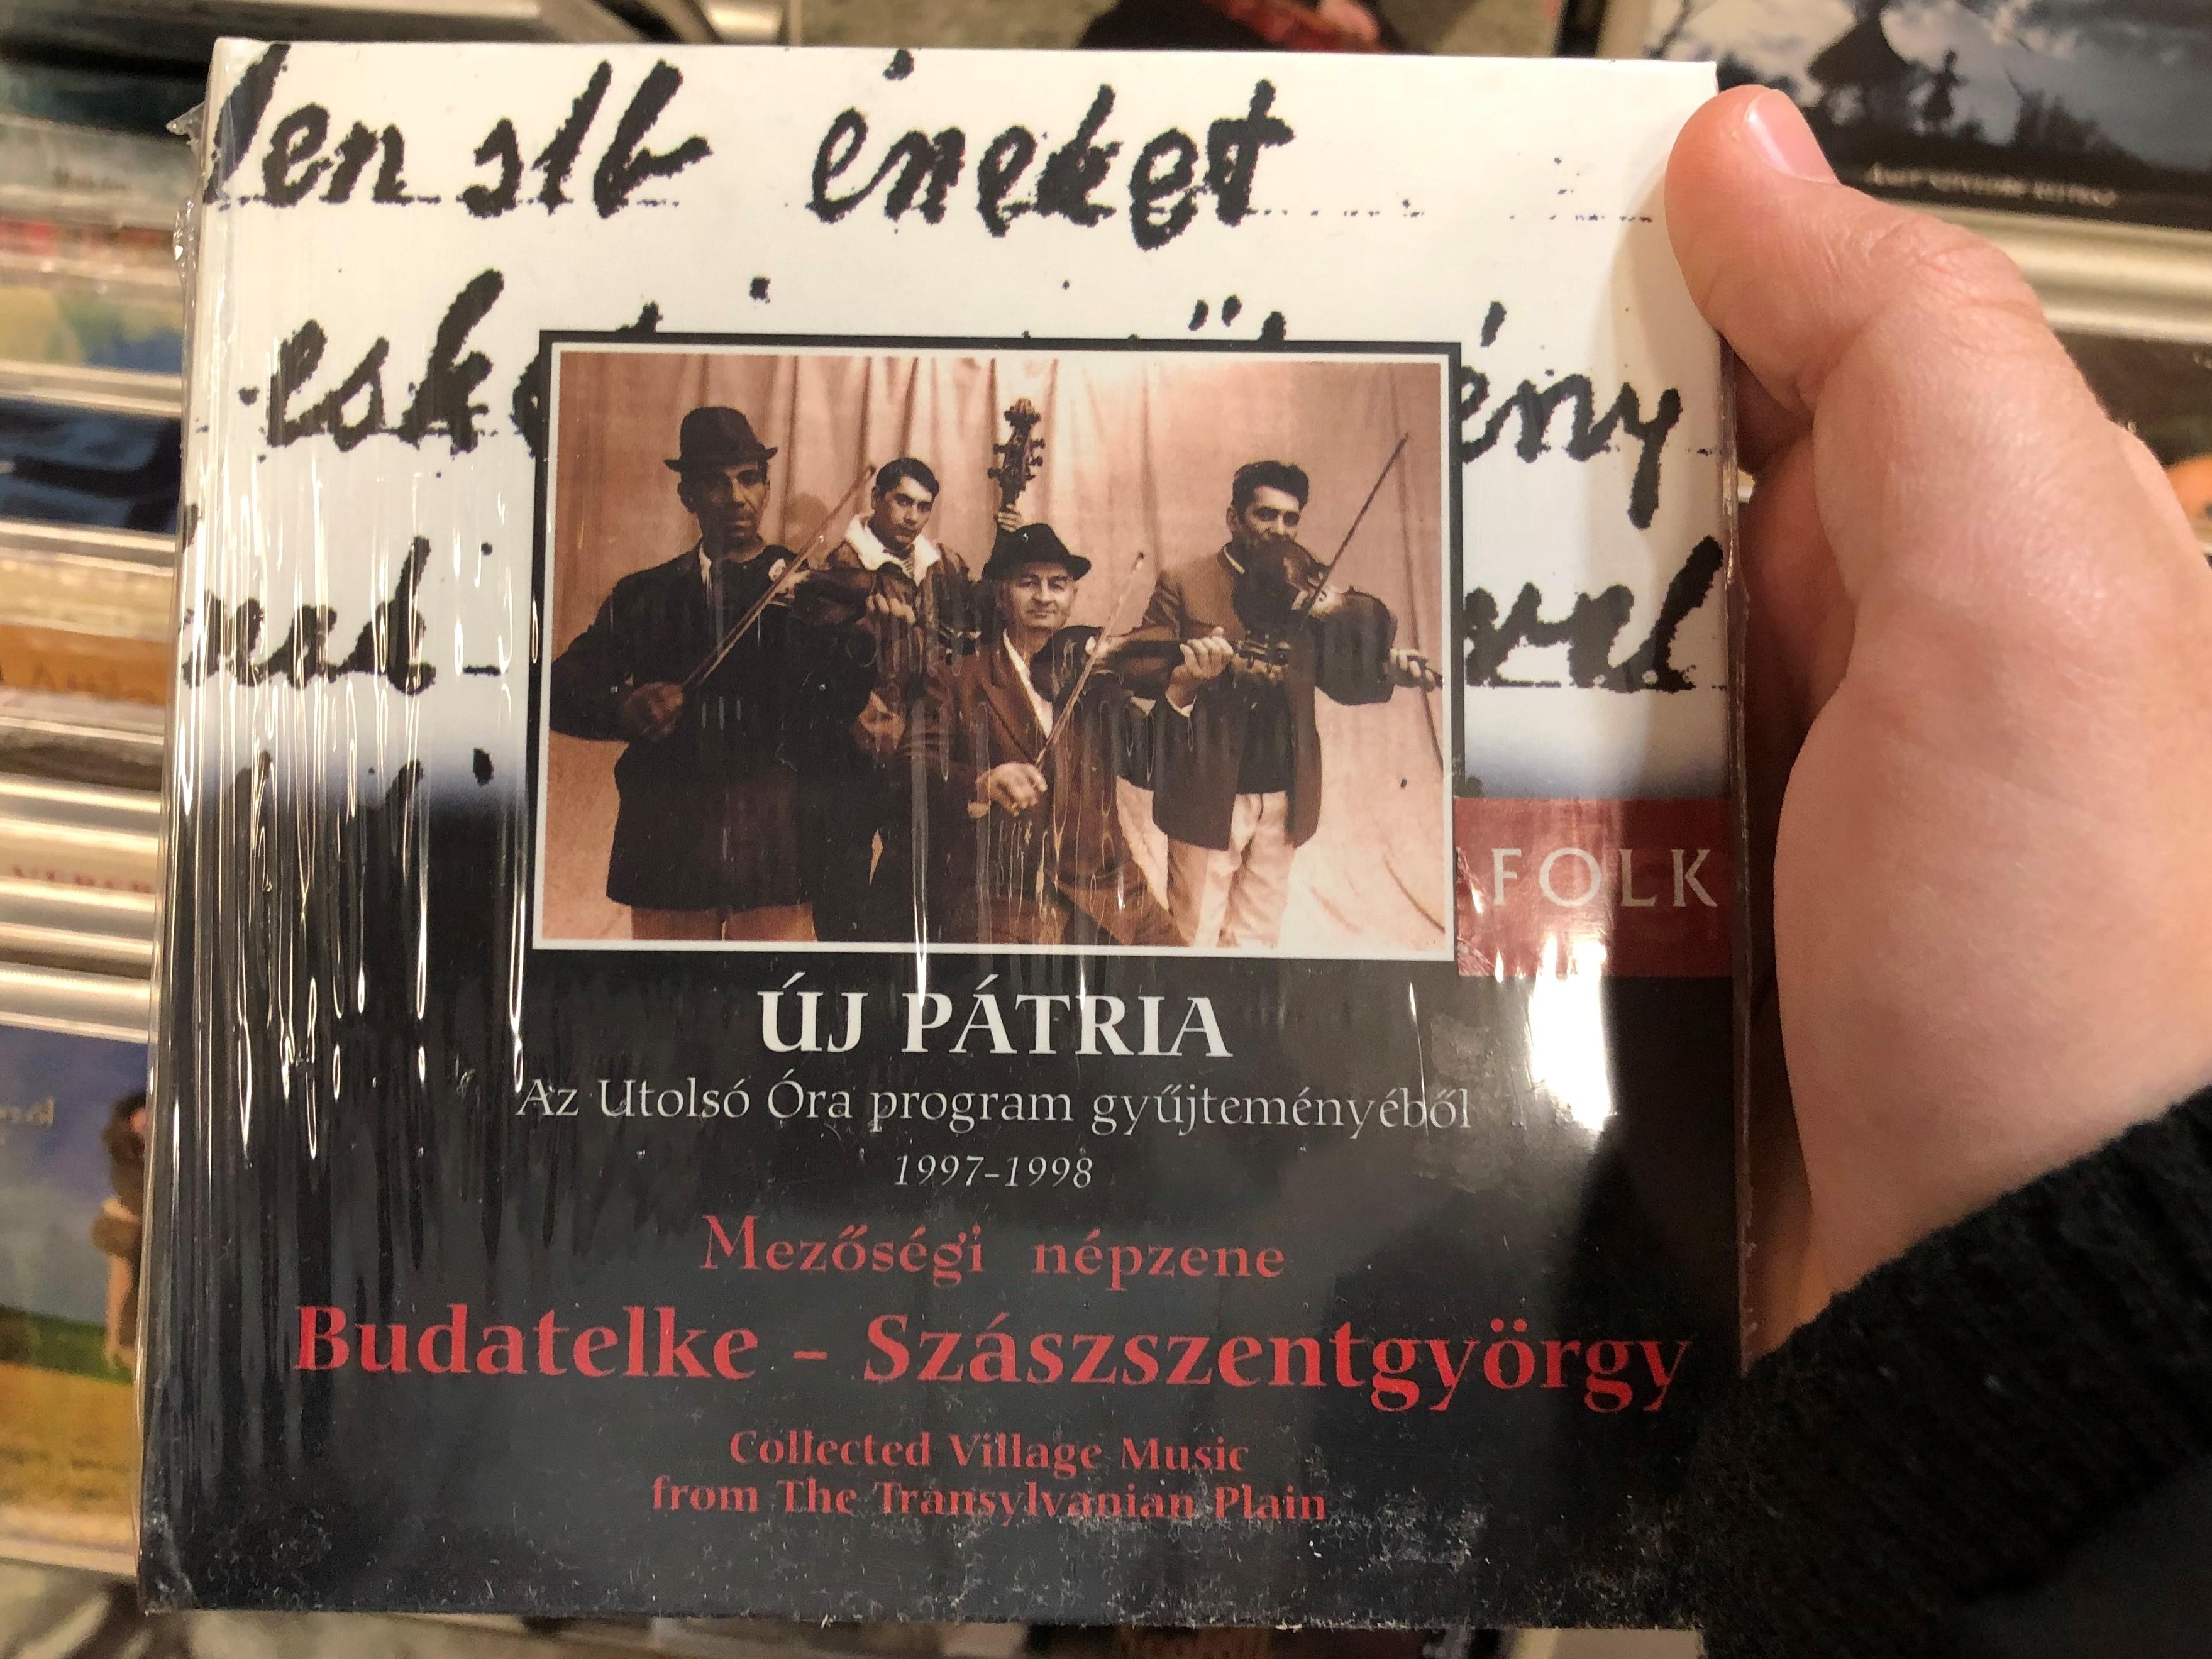 -j-p-tria-az-utols-ra-gy-jtem-ny-b-l-1997-1998-mez-s-gi-n-pzene-budatelke-sz-szszentgy-rgy-collected-village-music-from-the-transylvanian-plain-fon-records-audio-cd-1998-fa-102-2-1-.jpg